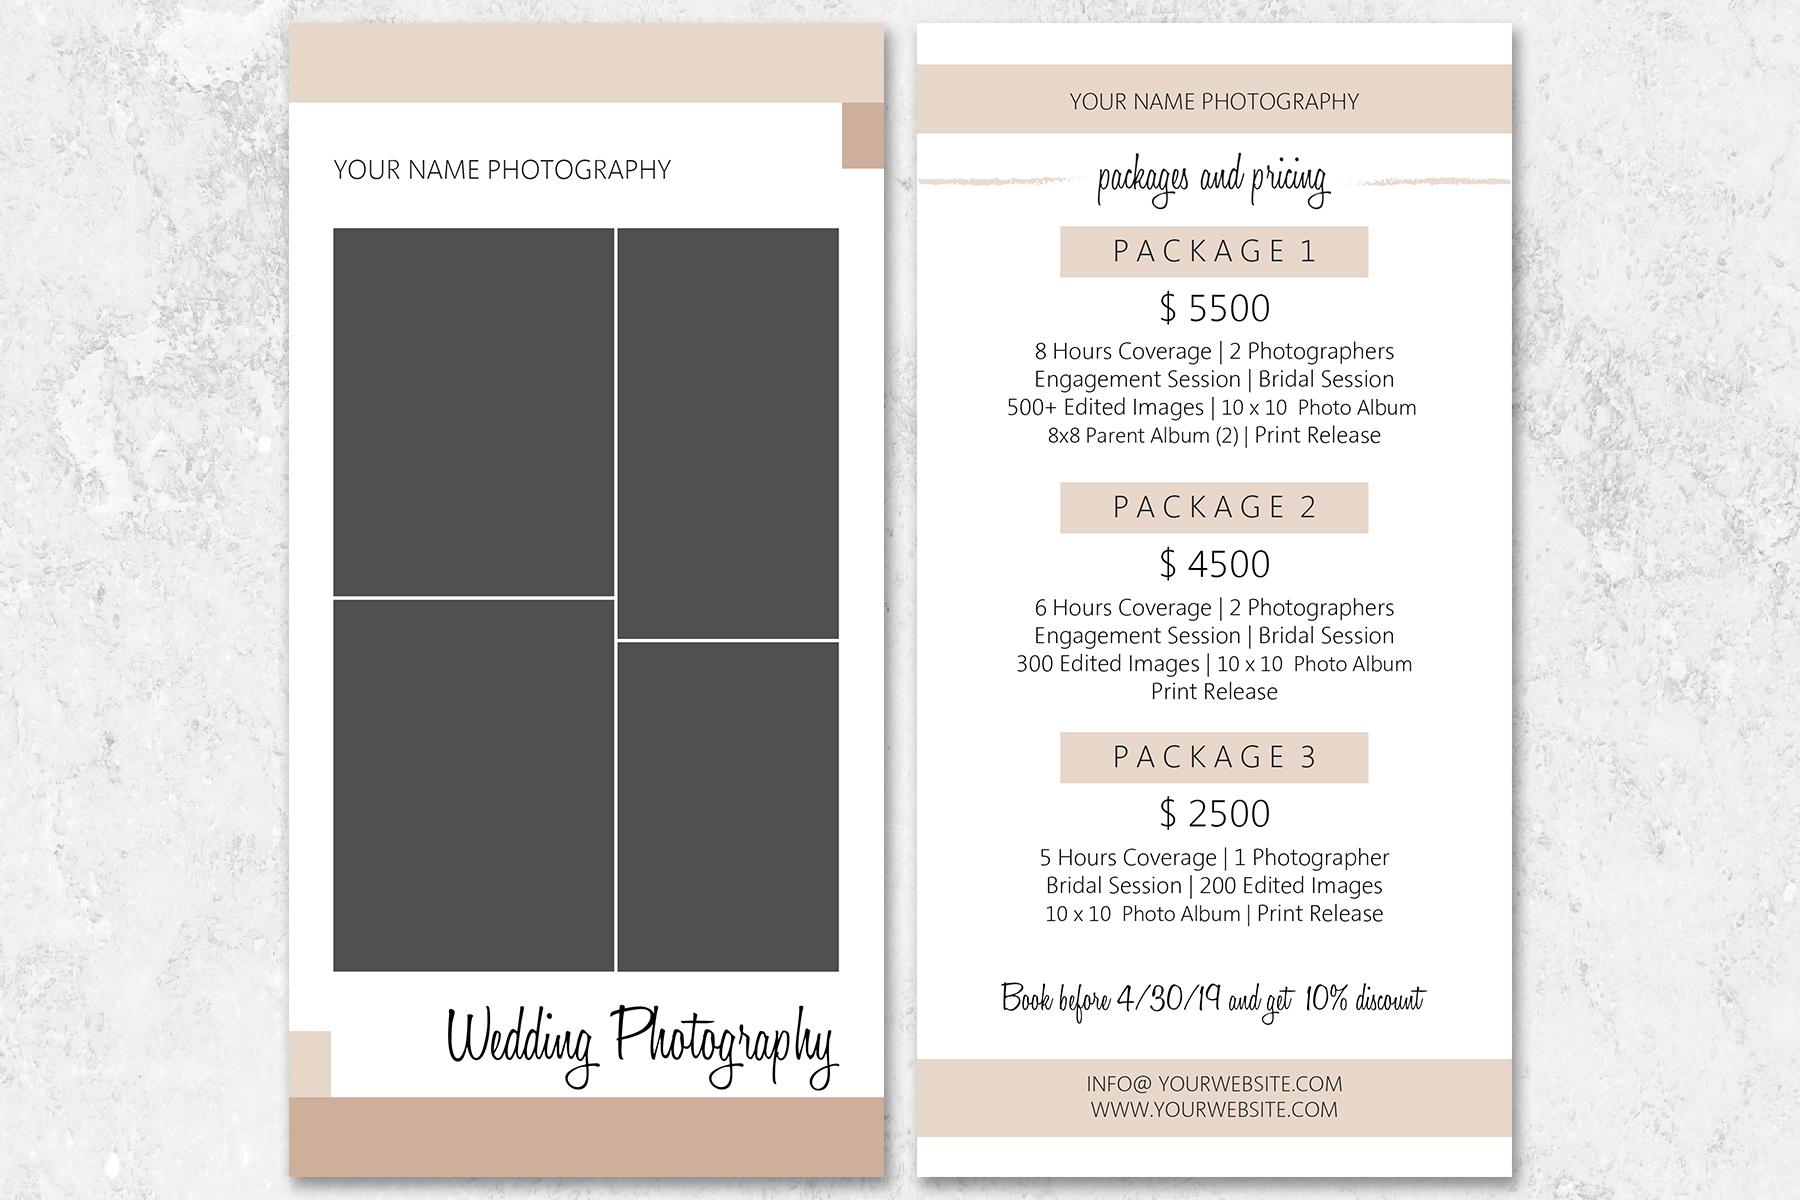 Wedding Photography Rack Card Template example image 2